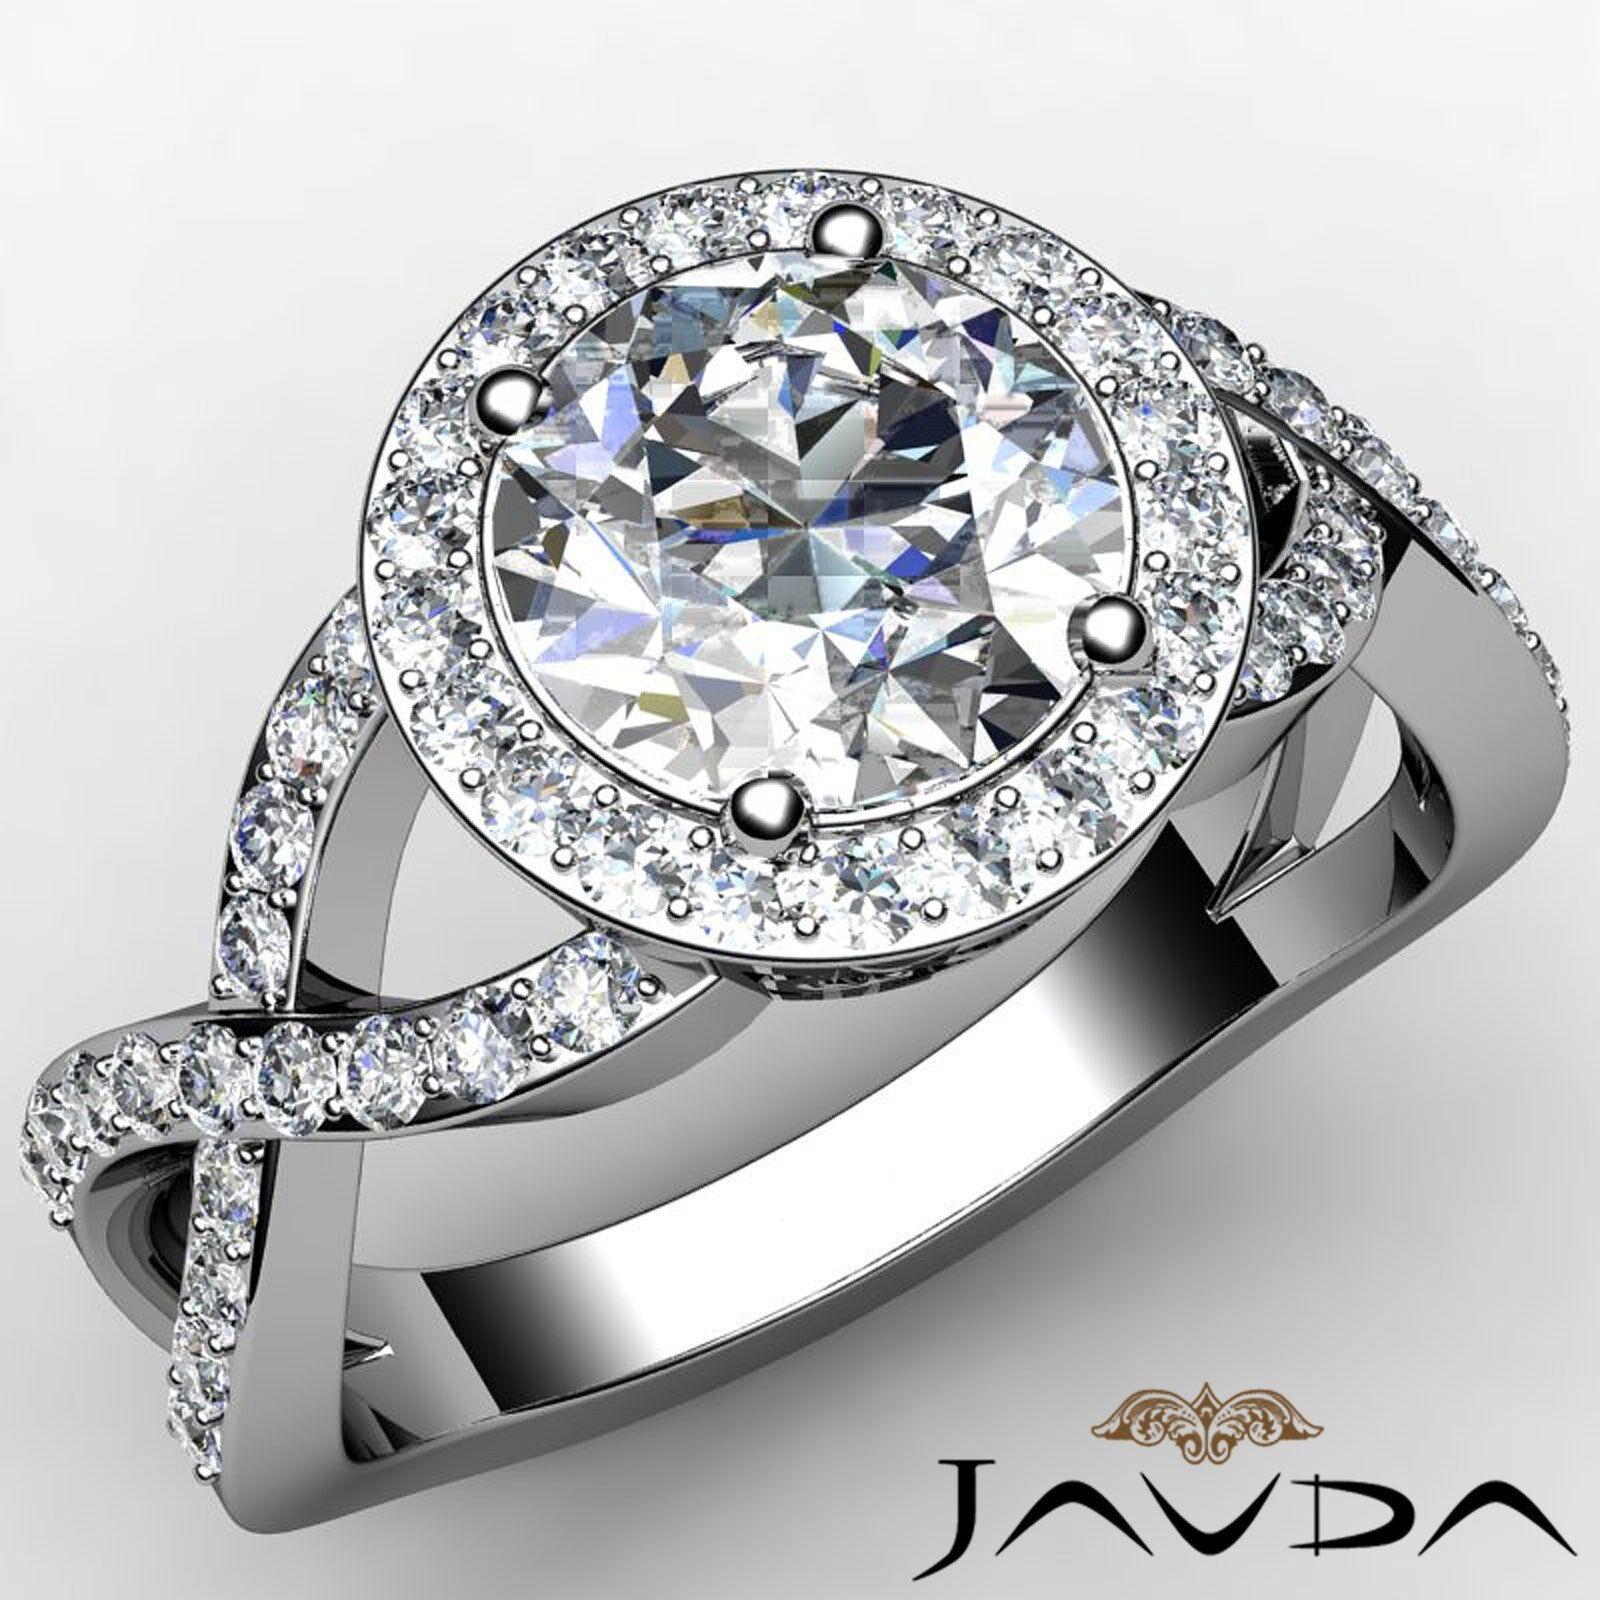 Halo Pave Setting Cross Shank Round Cut Diamond Engagement Ring GIA H VS1 2.2Ct